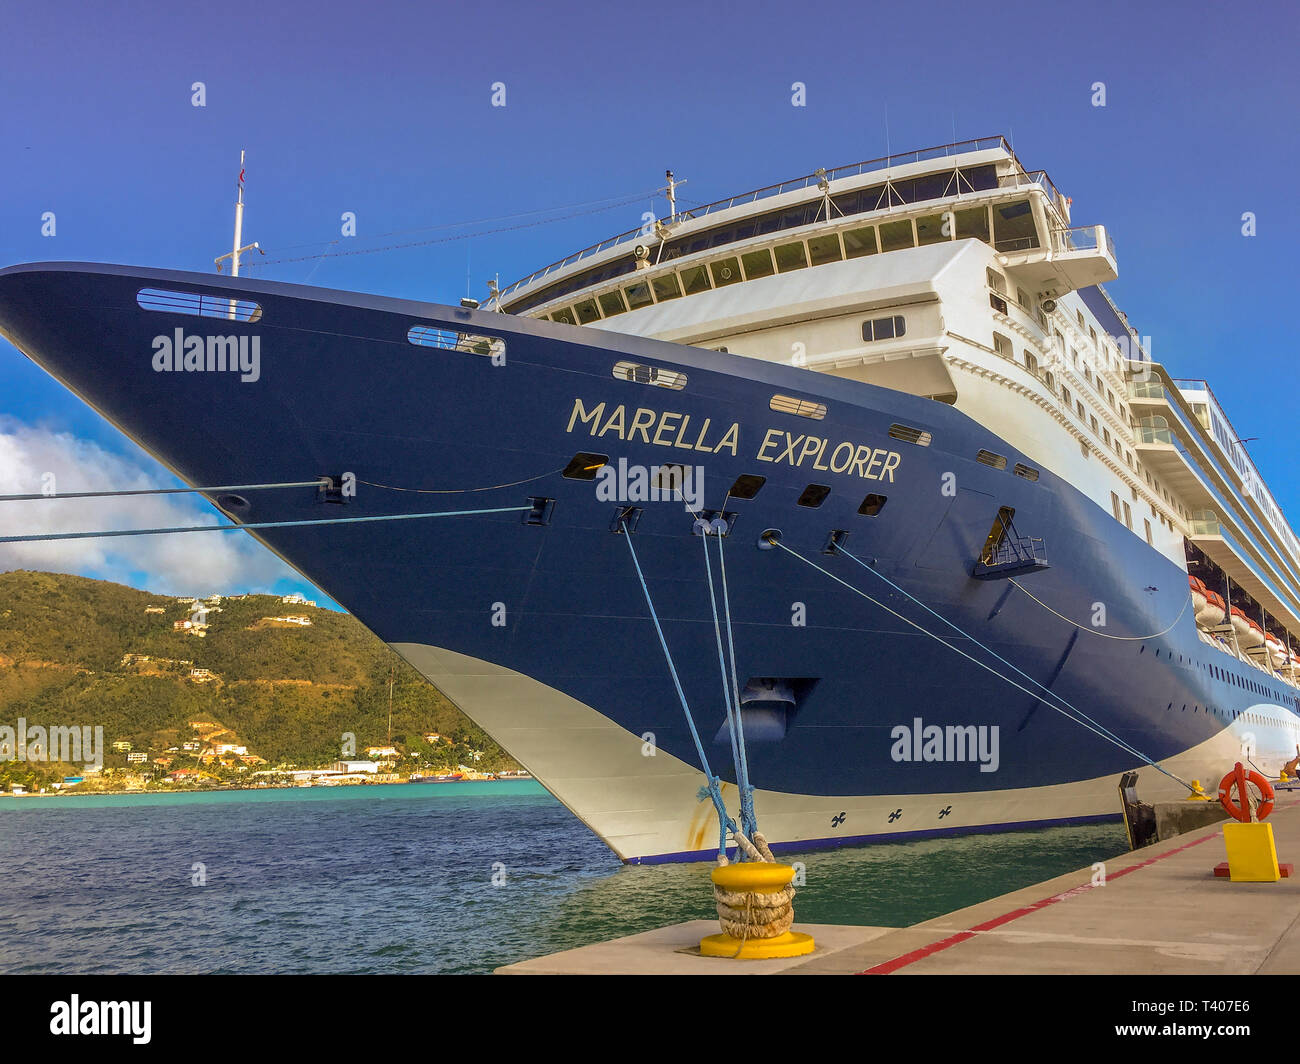 Tortolla Harbour Cruise Ship Marella Explorer Imagen De Stock